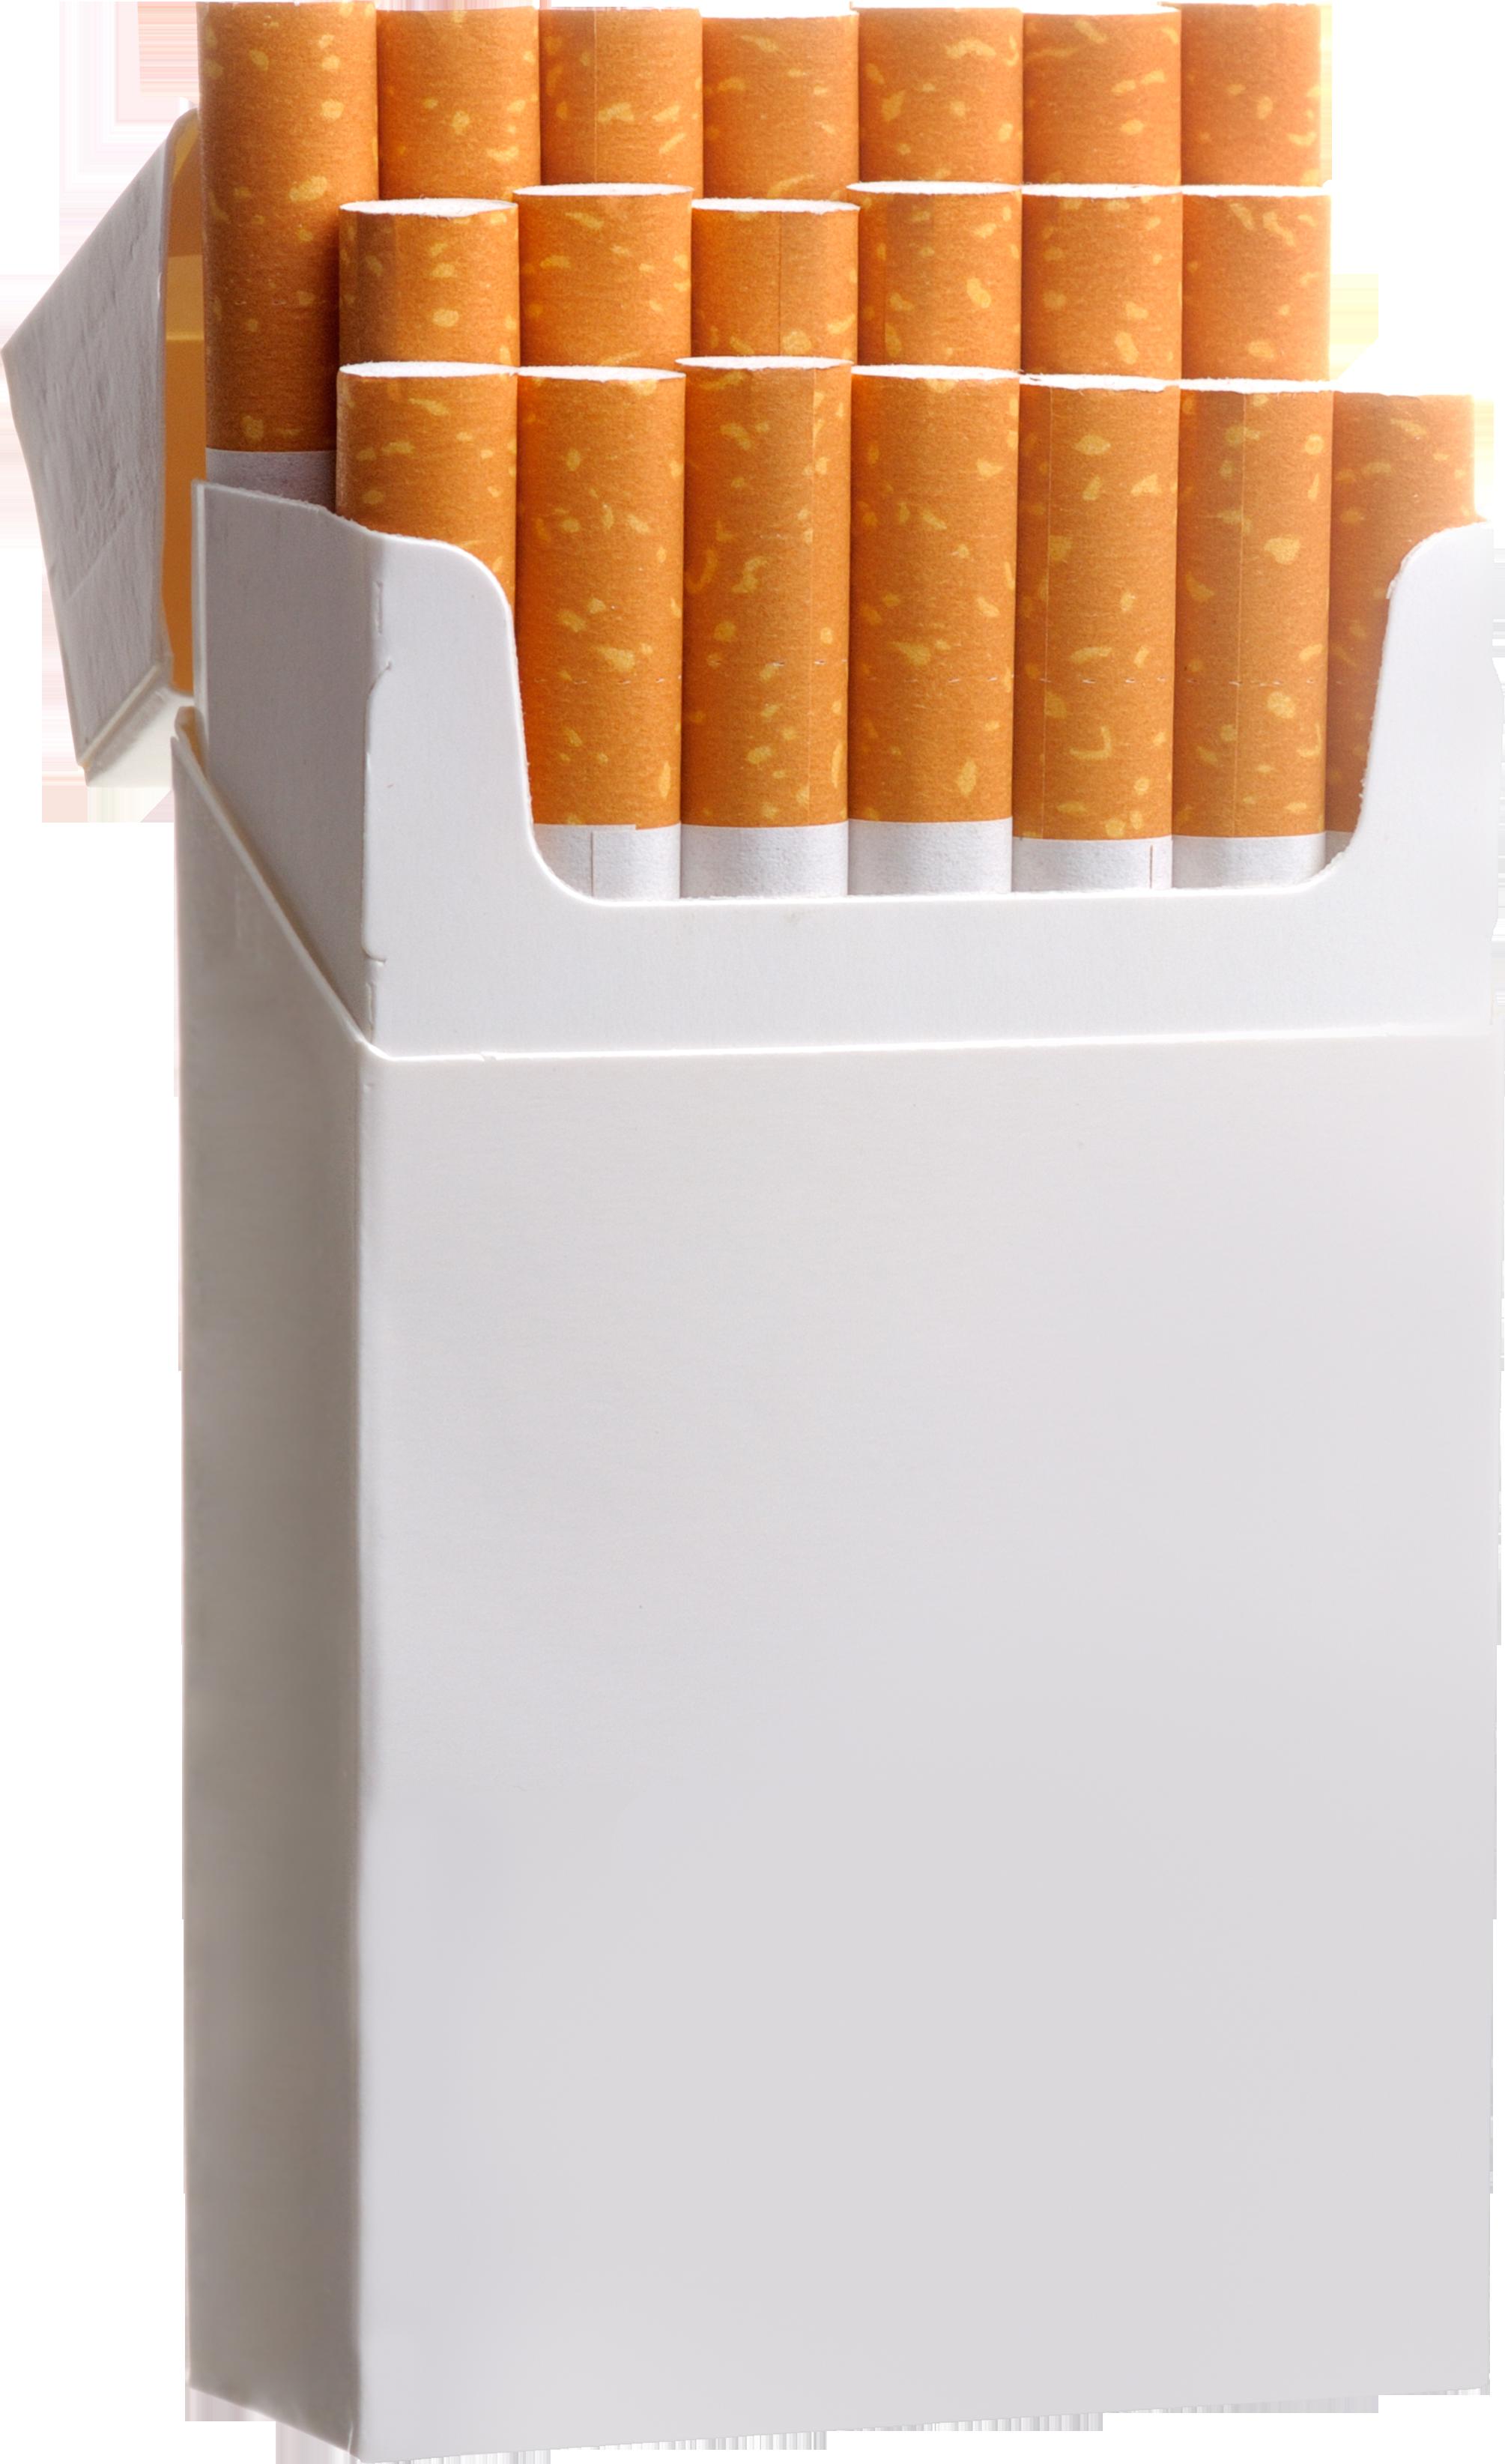 Cigarette Pack PNG Image - PurePNG | Free transparent CC0 ...